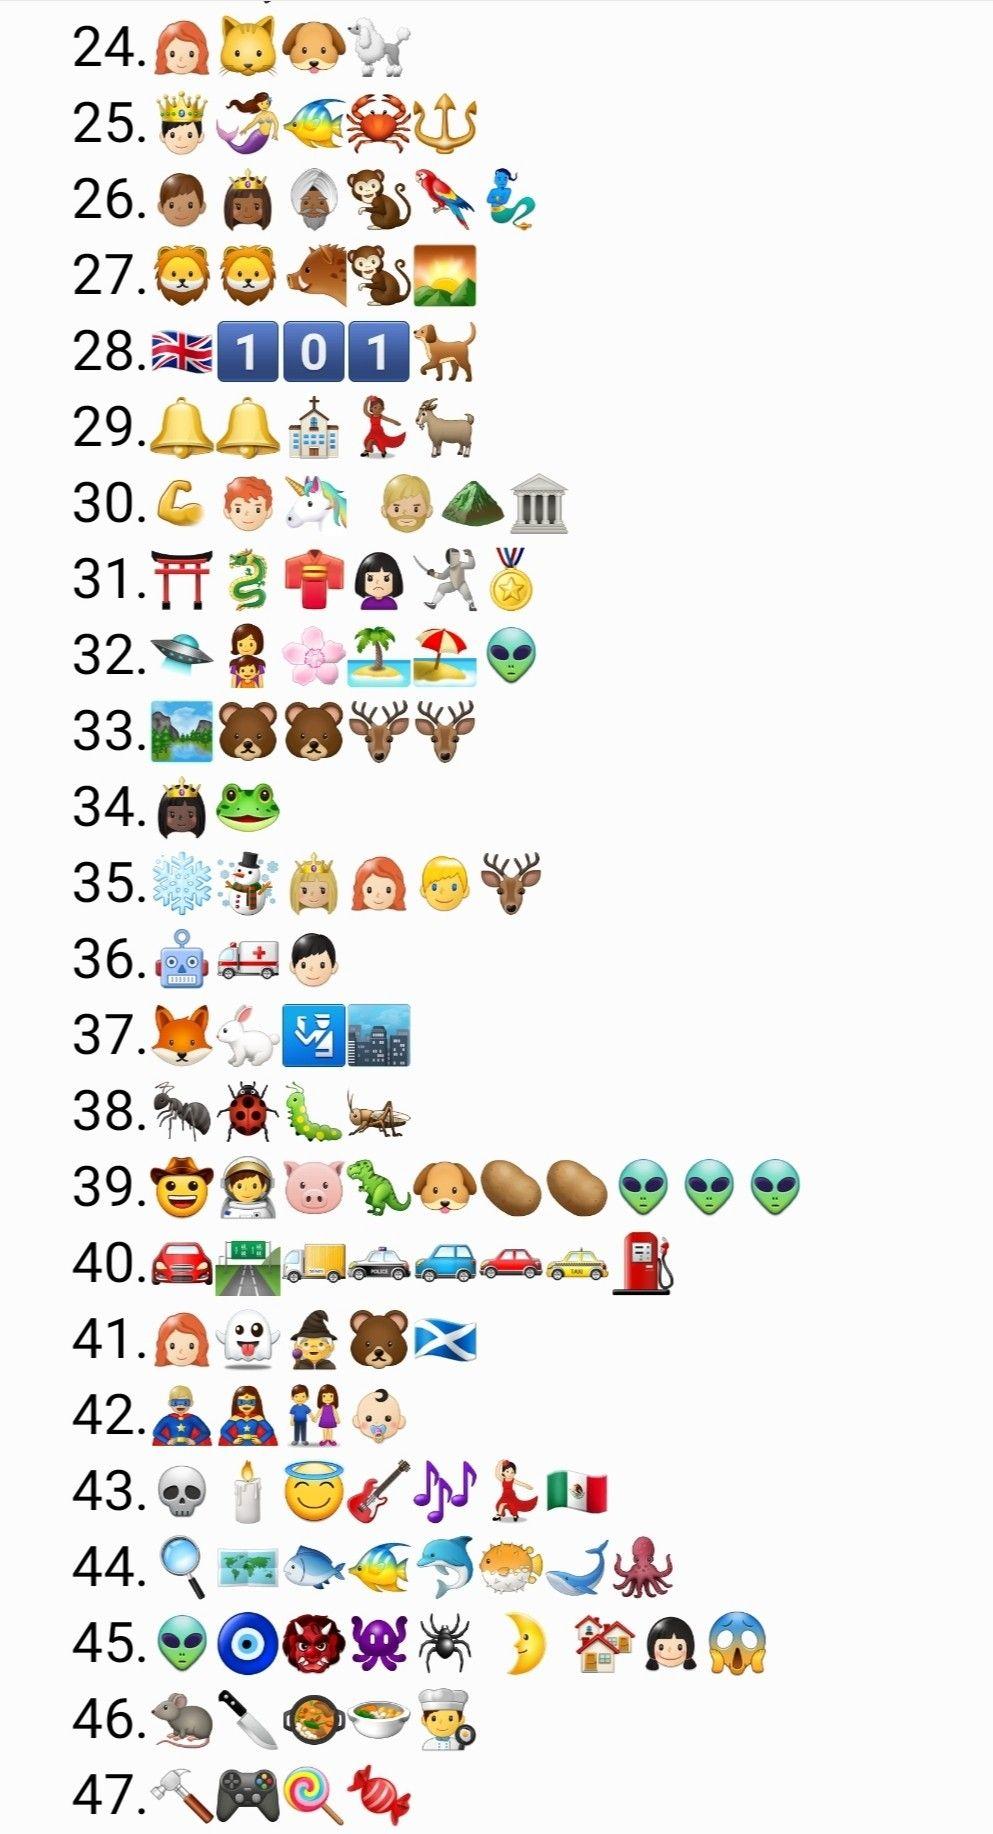 Disney Emoji Quiz part 2 | Emoji quiz, Disney emoji, Guess ...